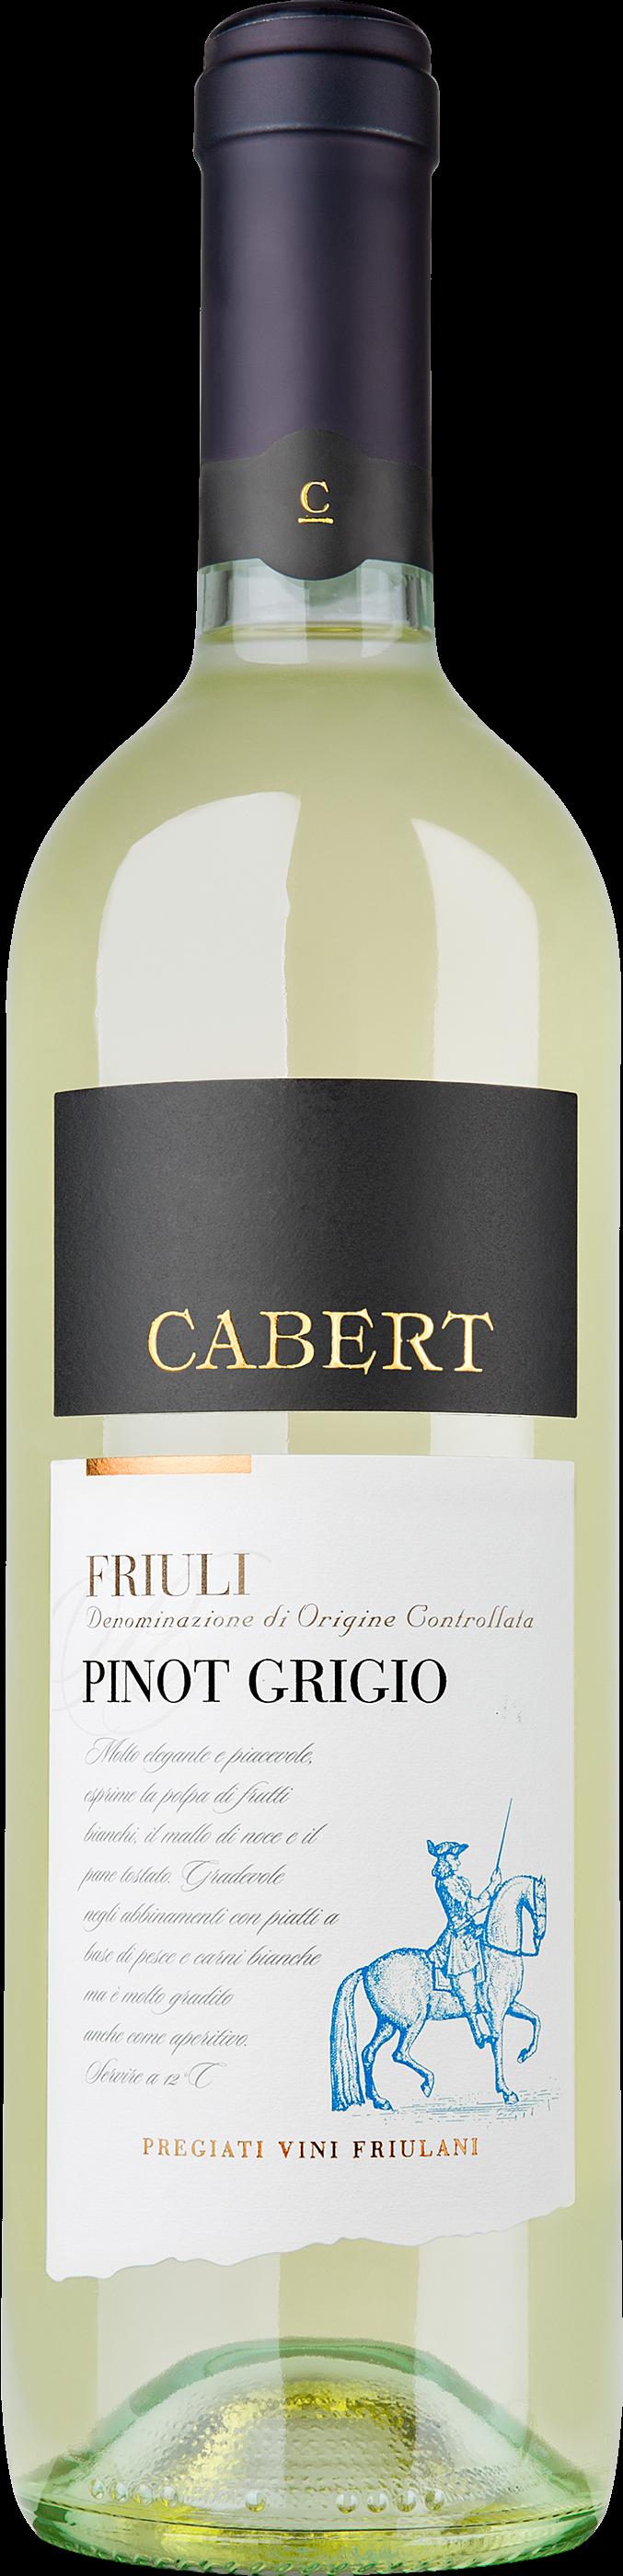 Bertiolo Pinot Grigio DOP Cabert